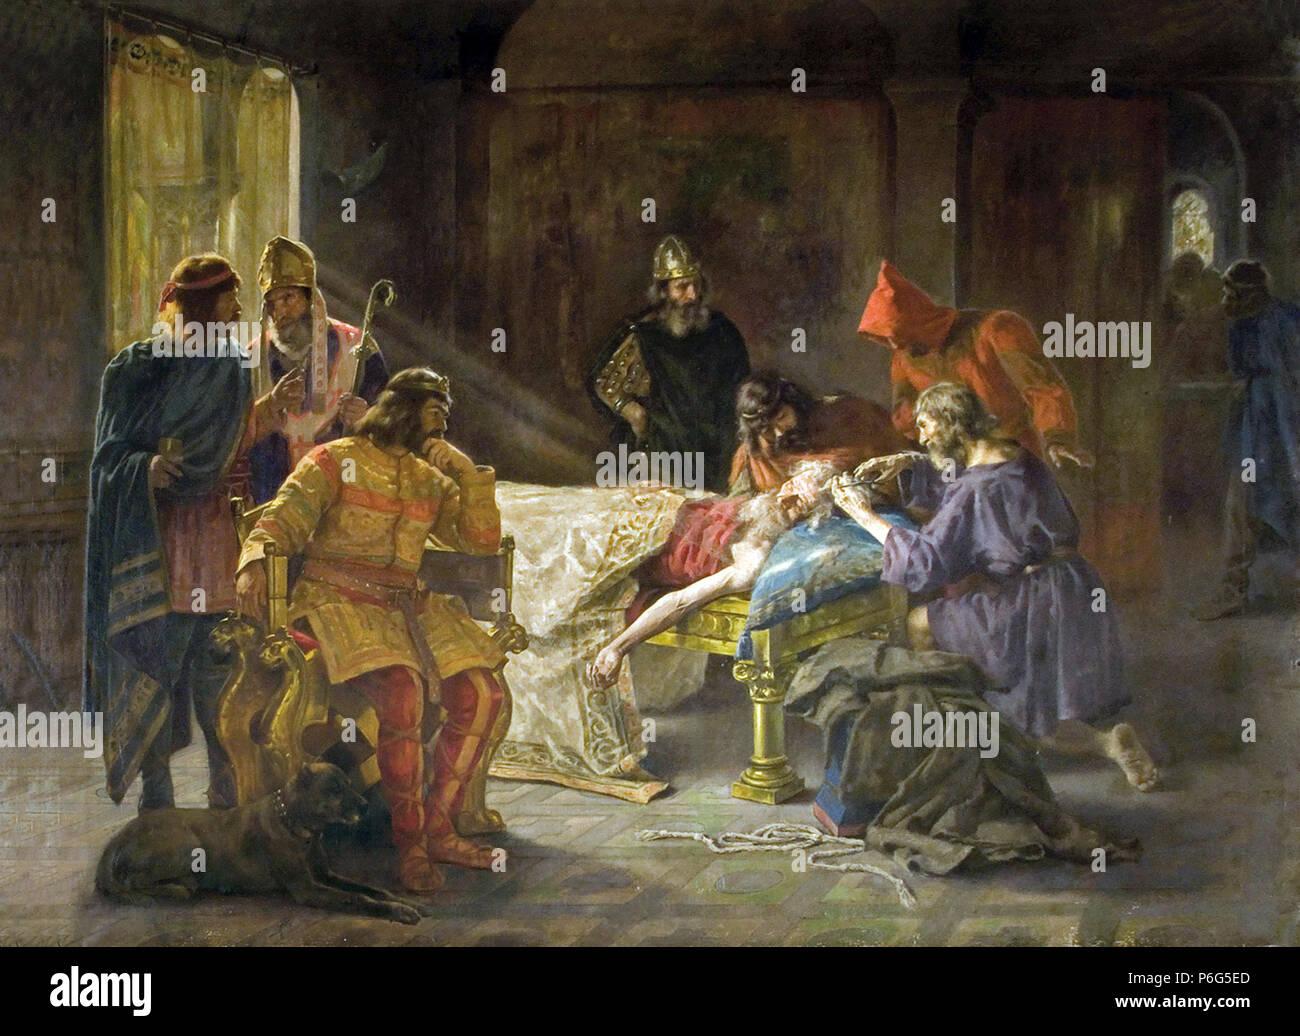 .  Català: La tonsura del rei Wamba .  Català: La tonsura del rei Wamba . (1894 c.) 66 La tonsura del rei Wamba - Joan Brull i Vinyoles (1863-1912) Stock Photo